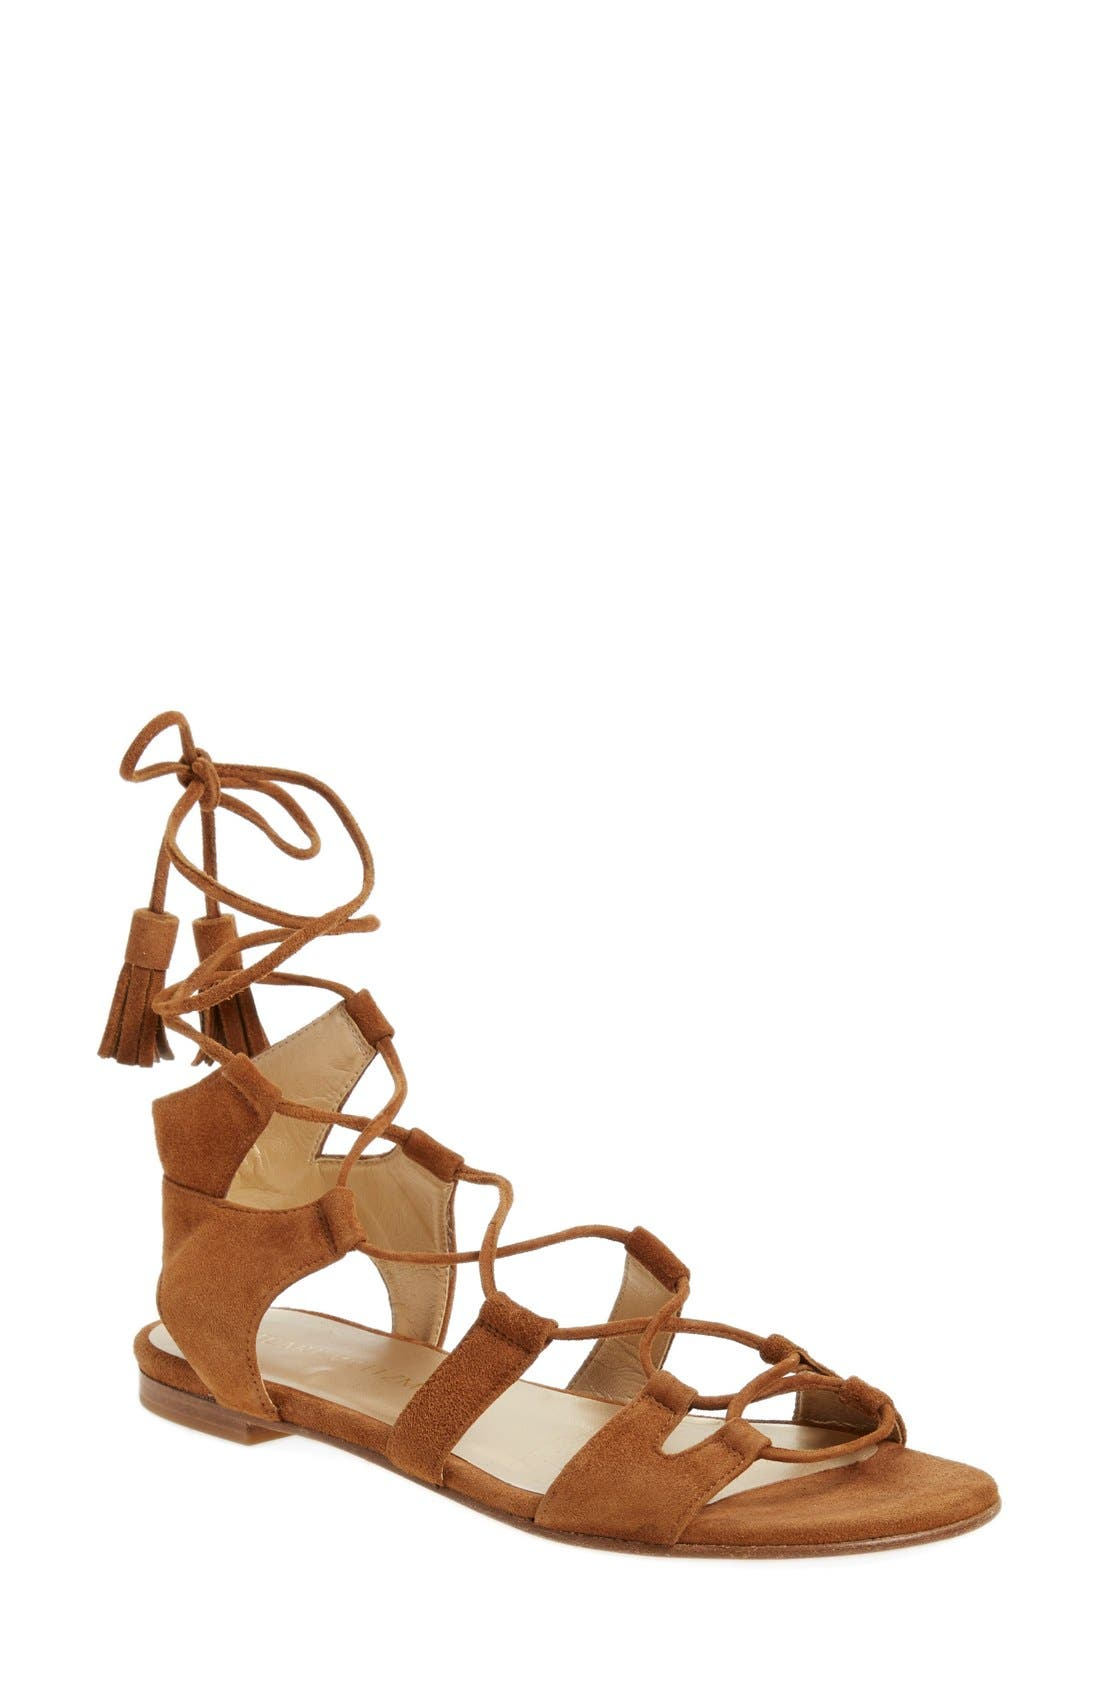 Main Image - Stuart Weitzman 'Romanflat' Ghillie Sandal (Women)